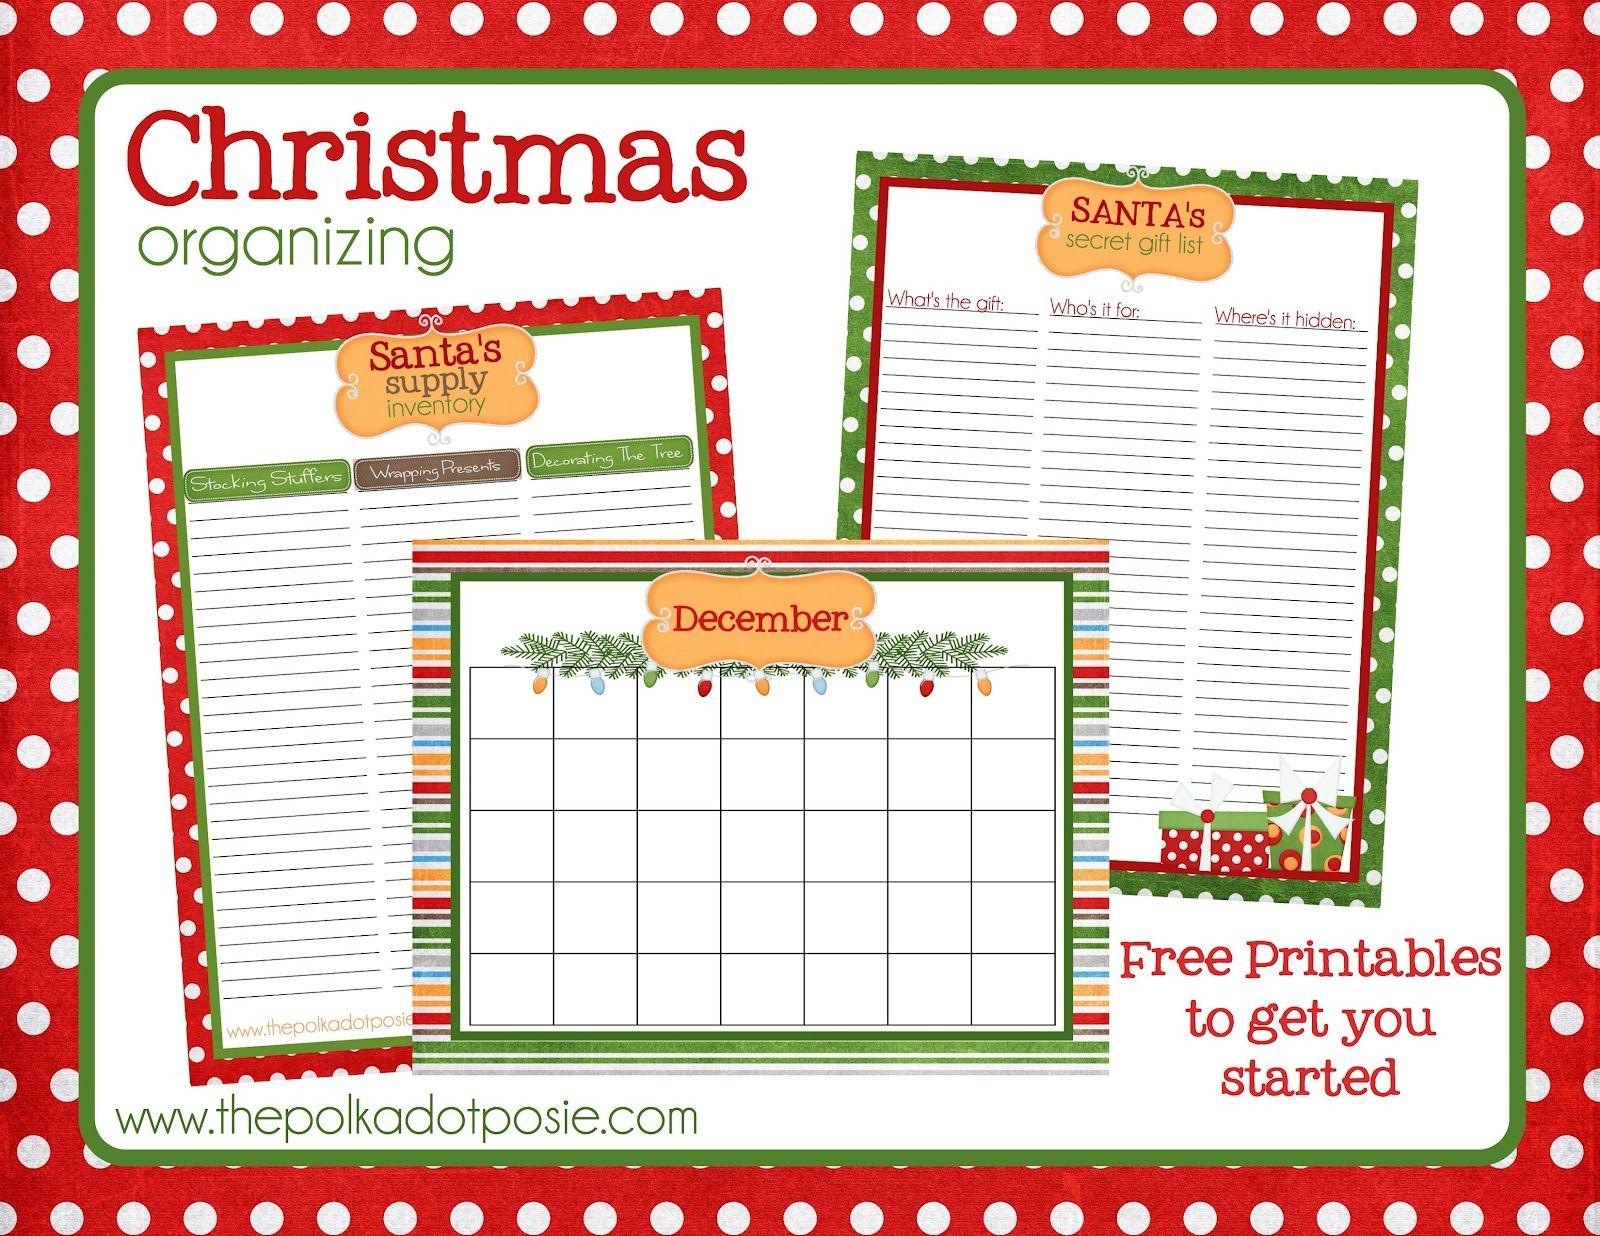 free christmas printables blank december calendar santa 39 s supply list and santa 39 s secret gift. Black Bedroom Furniture Sets. Home Design Ideas